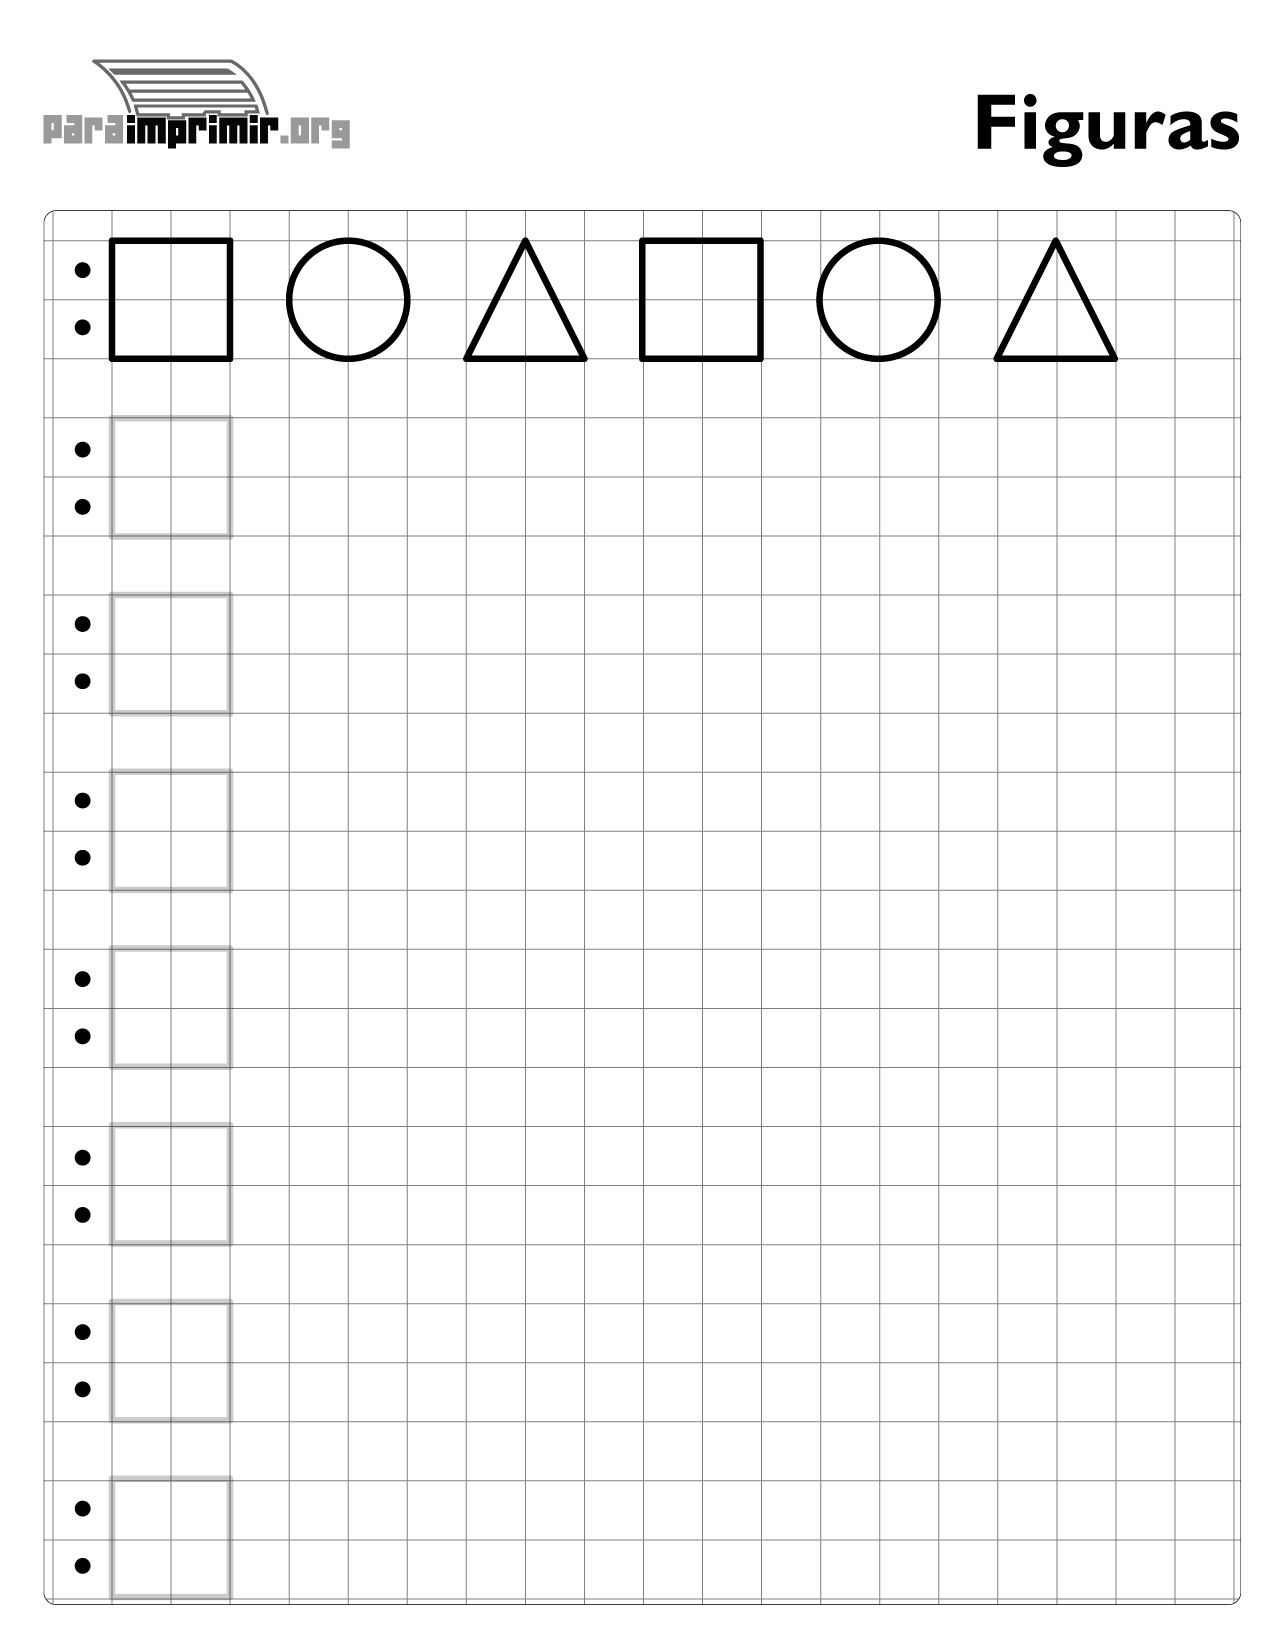 Figuras Geometricas Para Aprender Y Para Imprimir